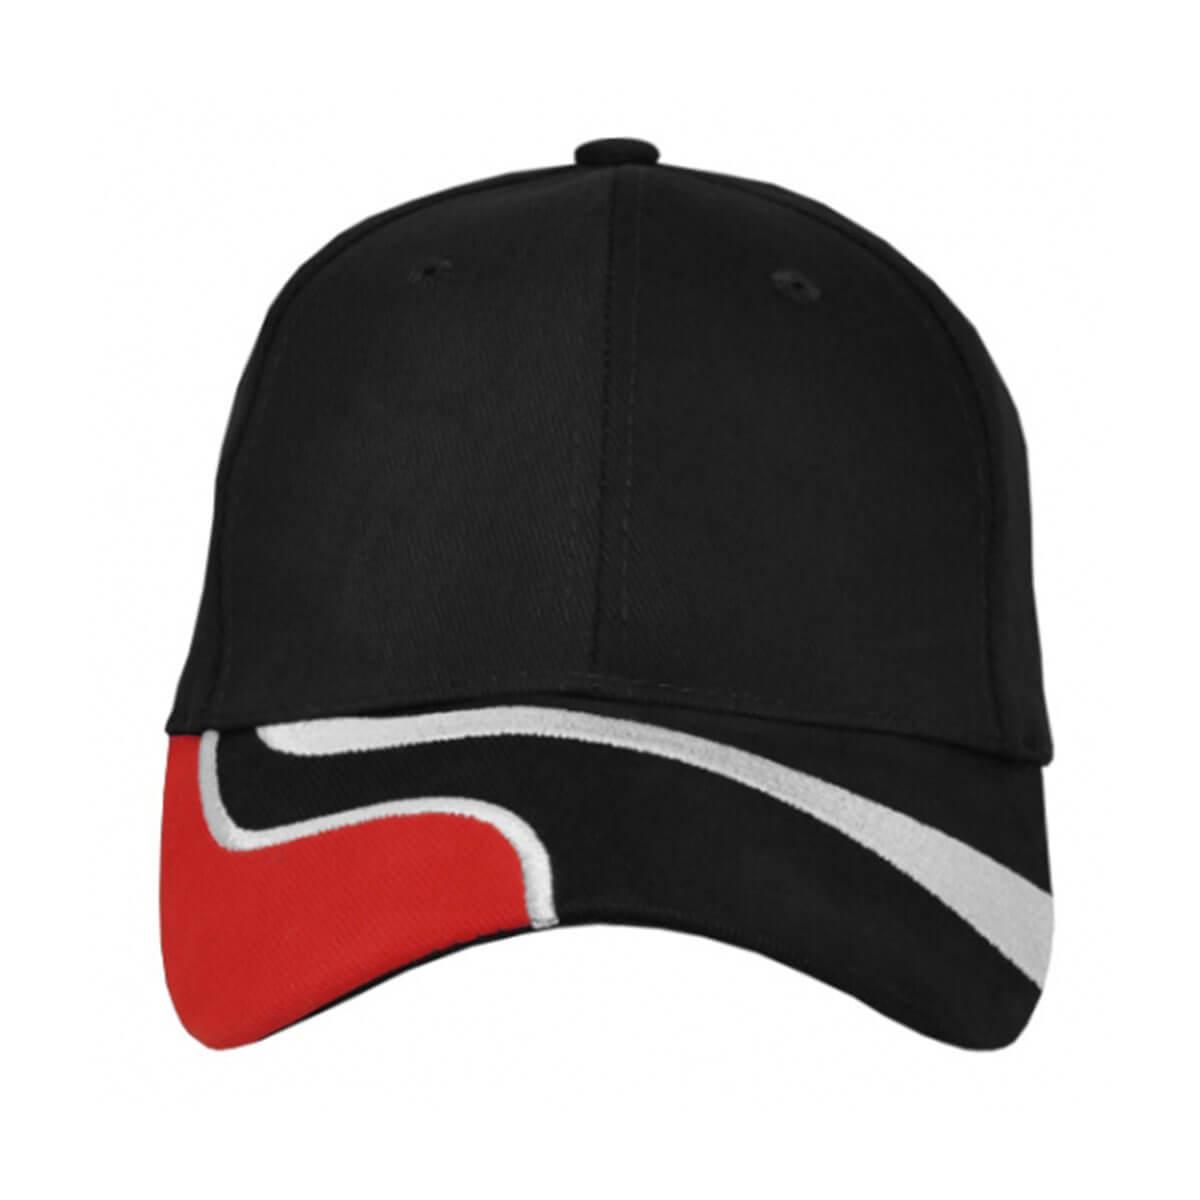 Highway Cap-Black / White / Red